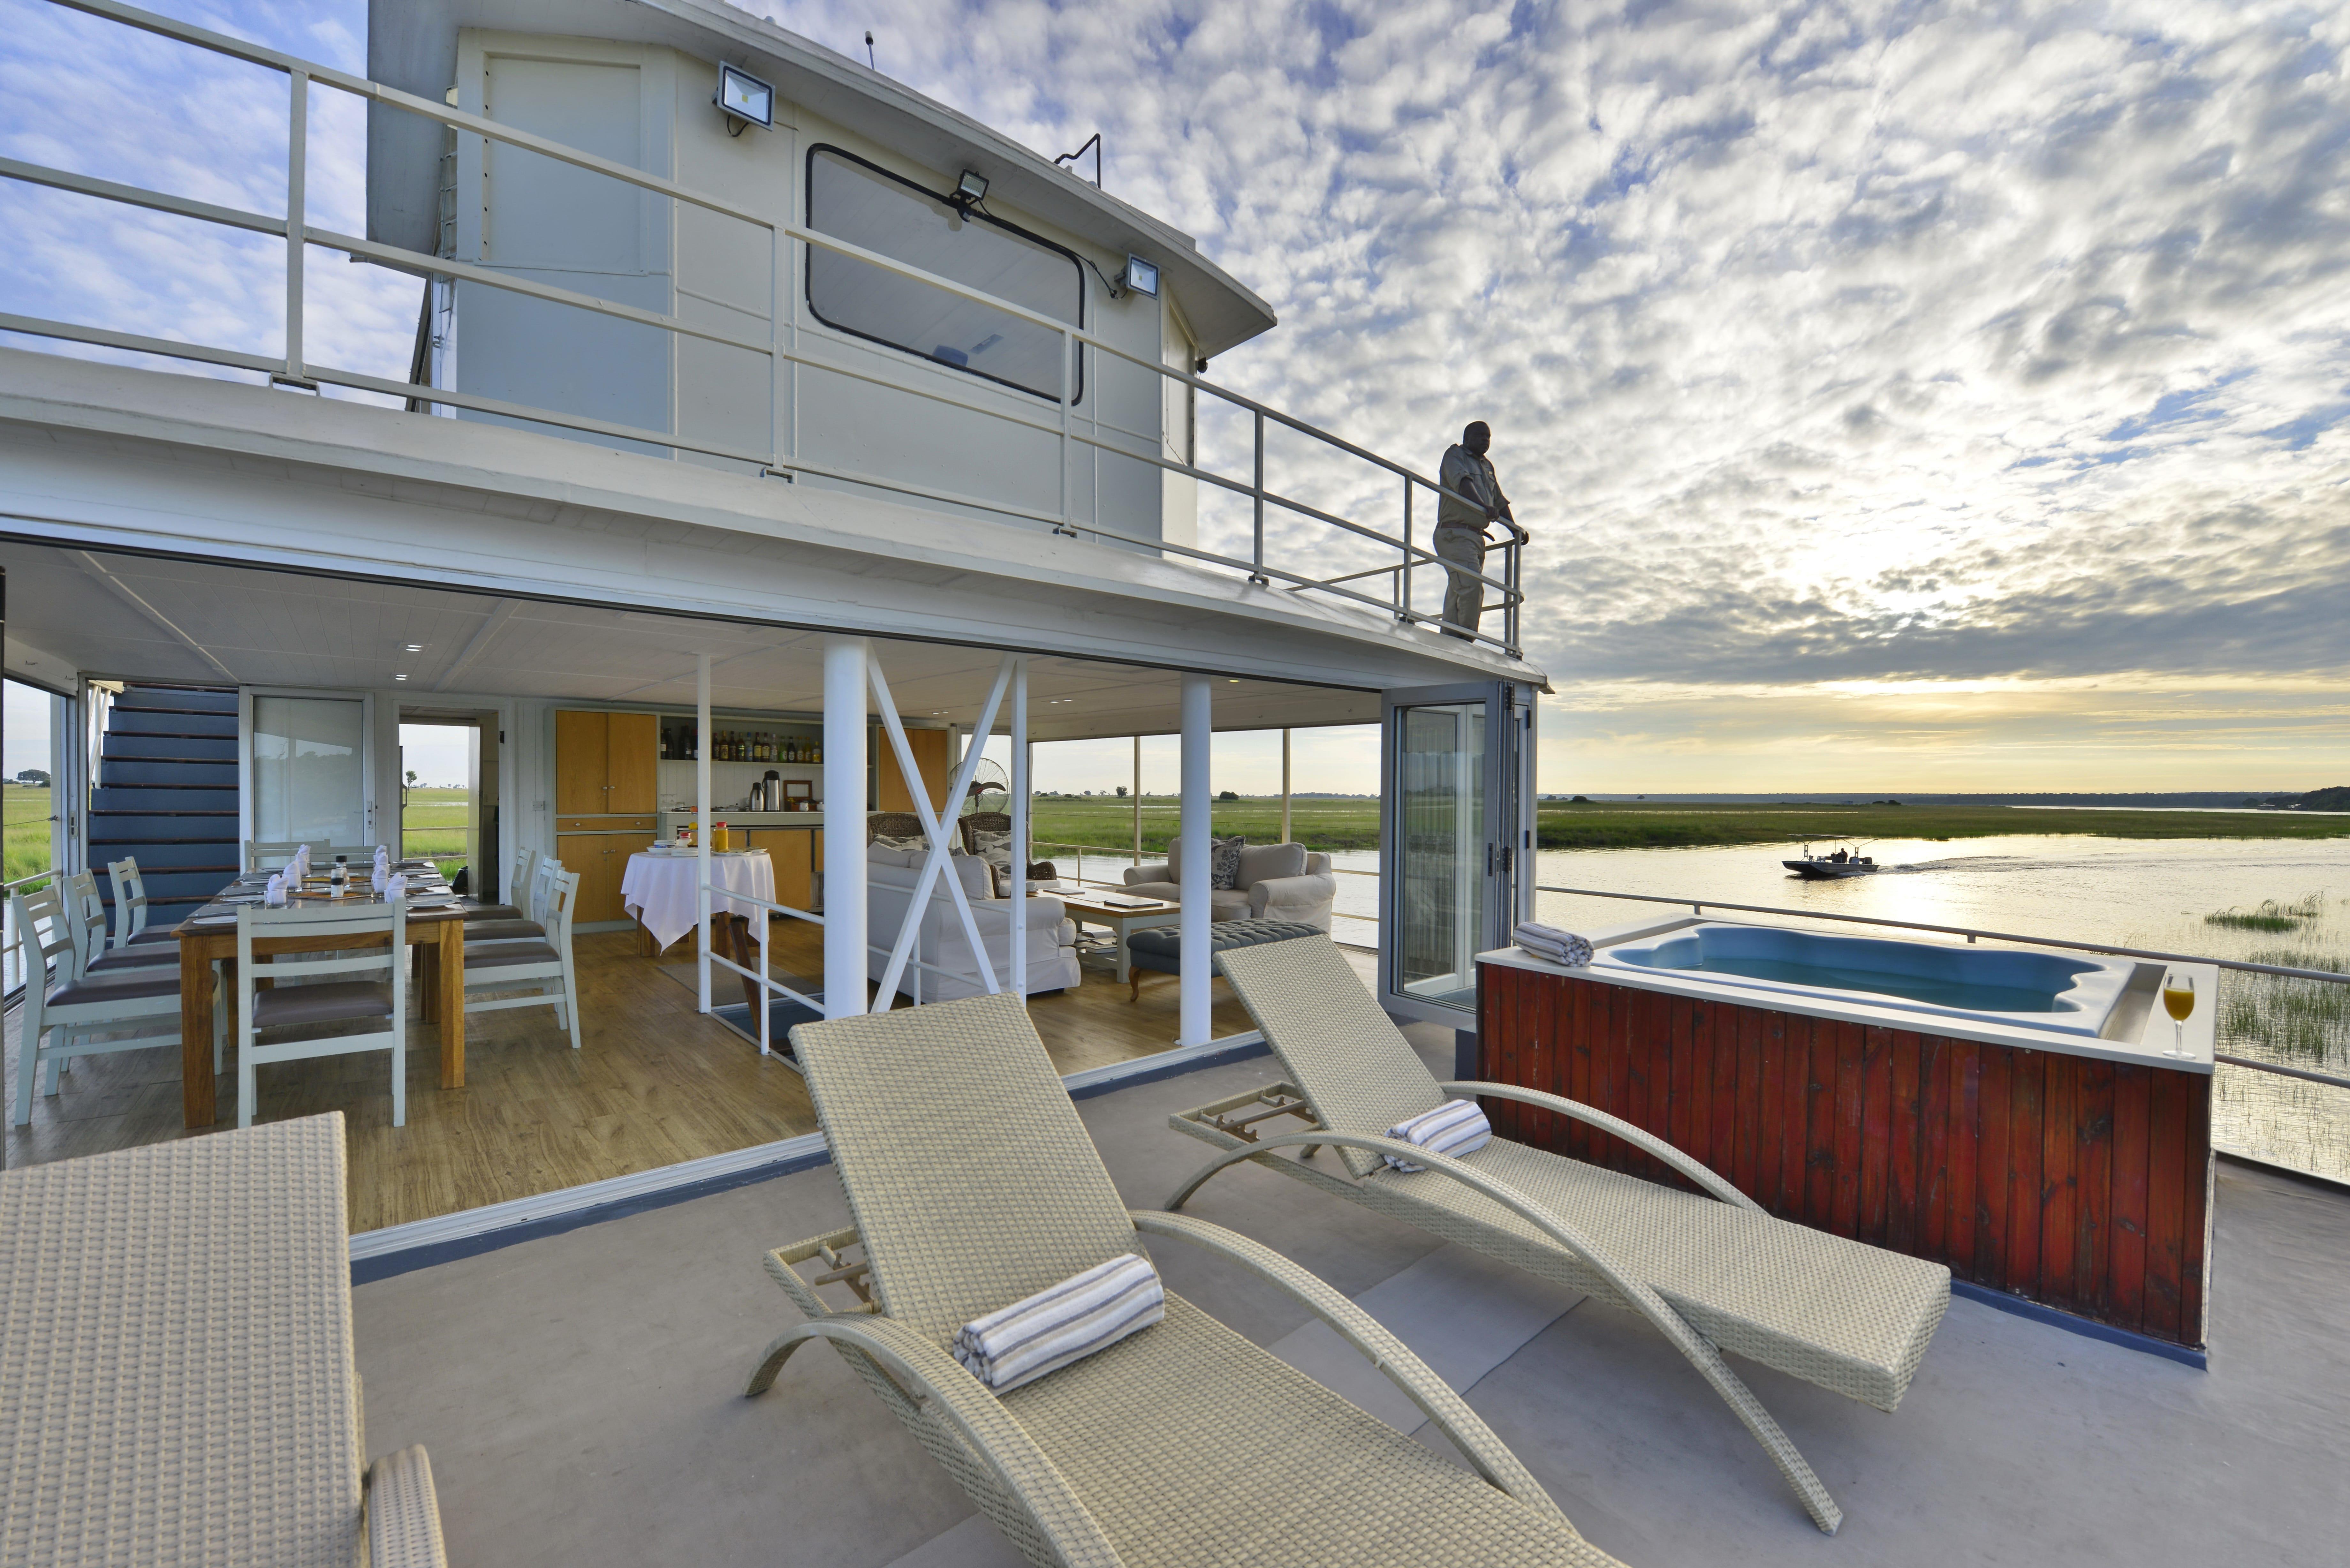 Chobe Princess houseboat deck